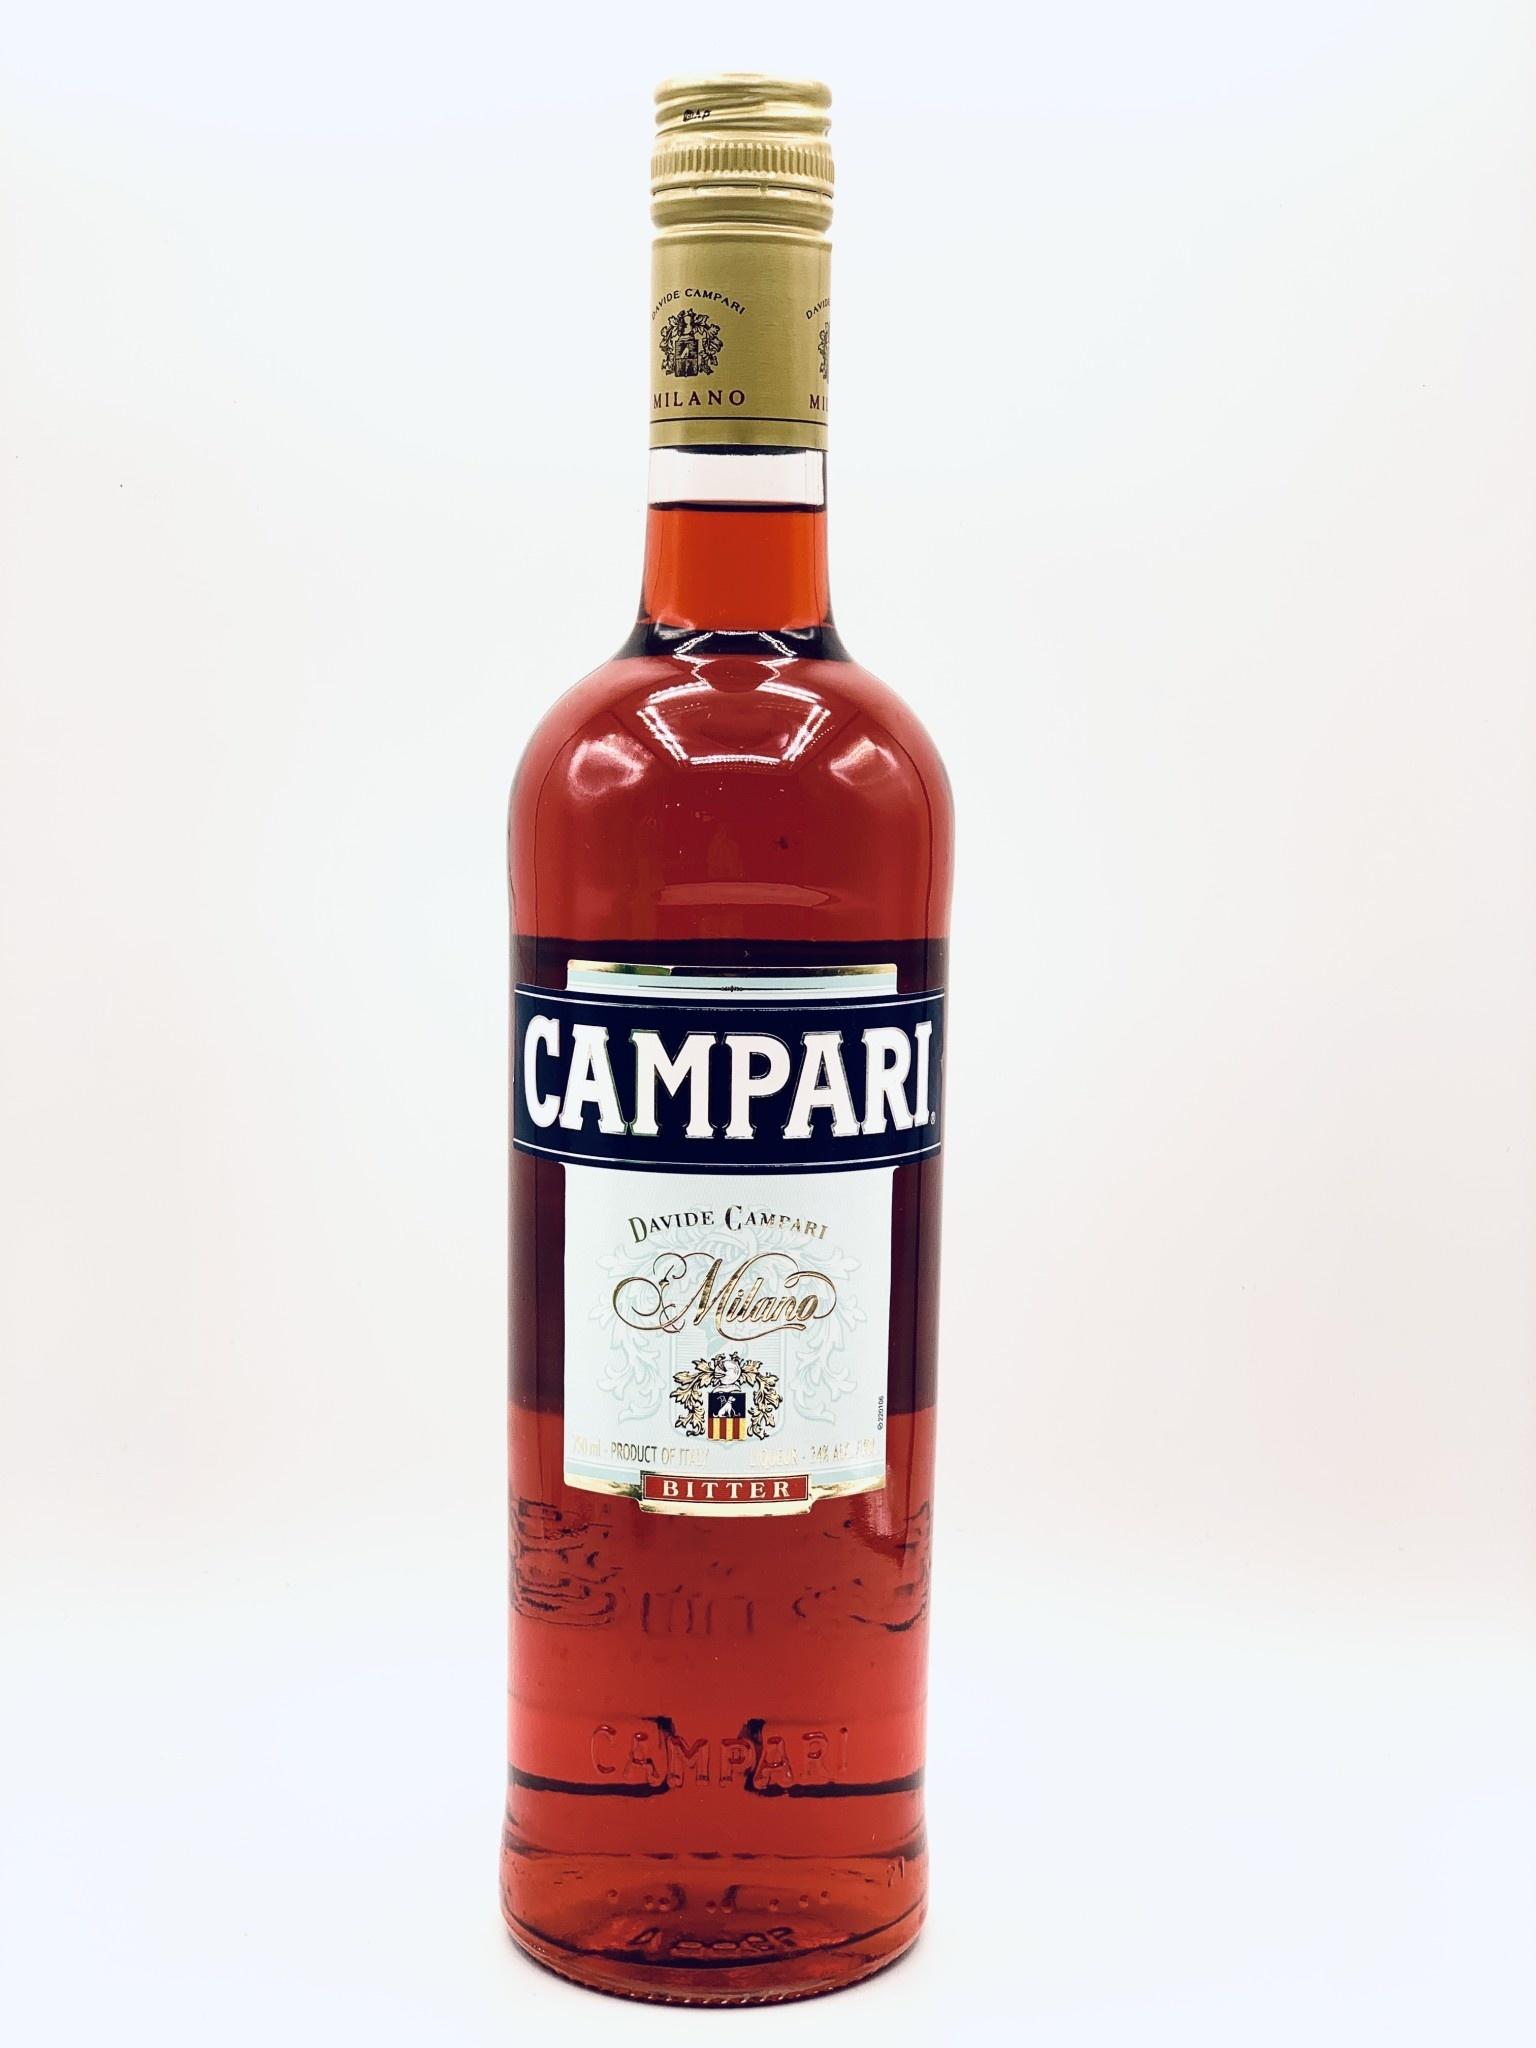 Davide Campari Milano Bitters 750ml (48 proof)